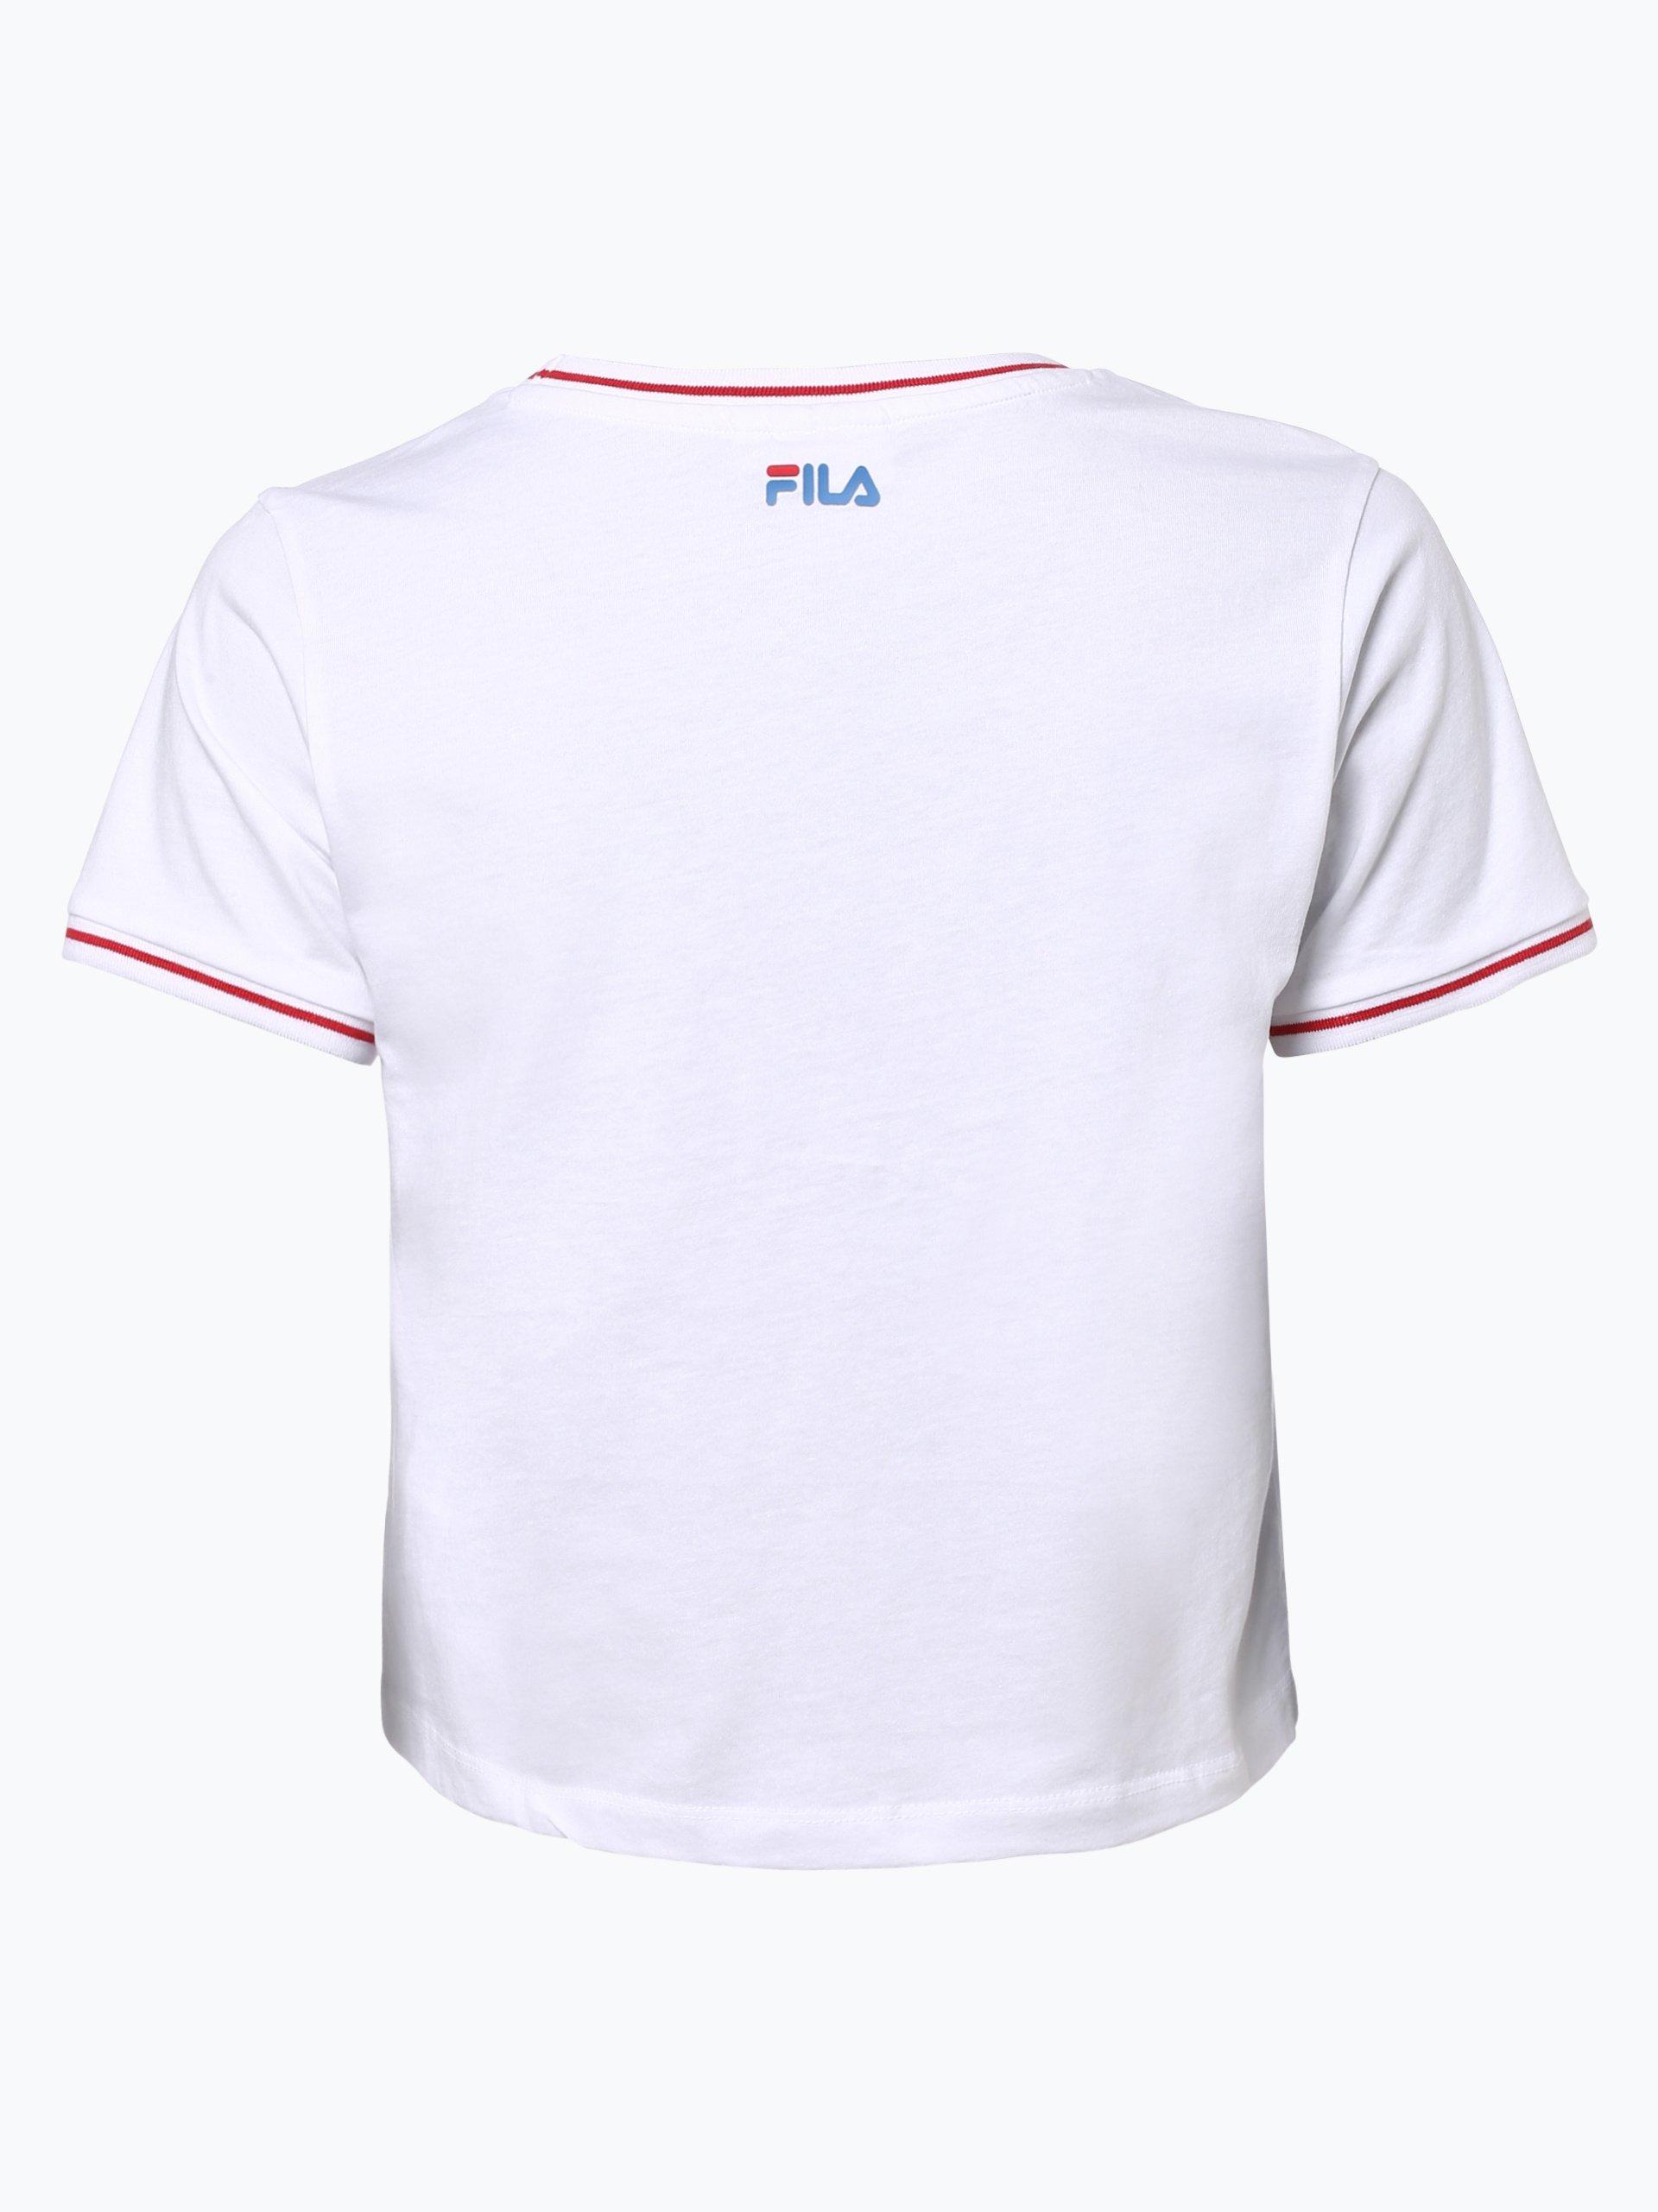 FILA T-shirt damski